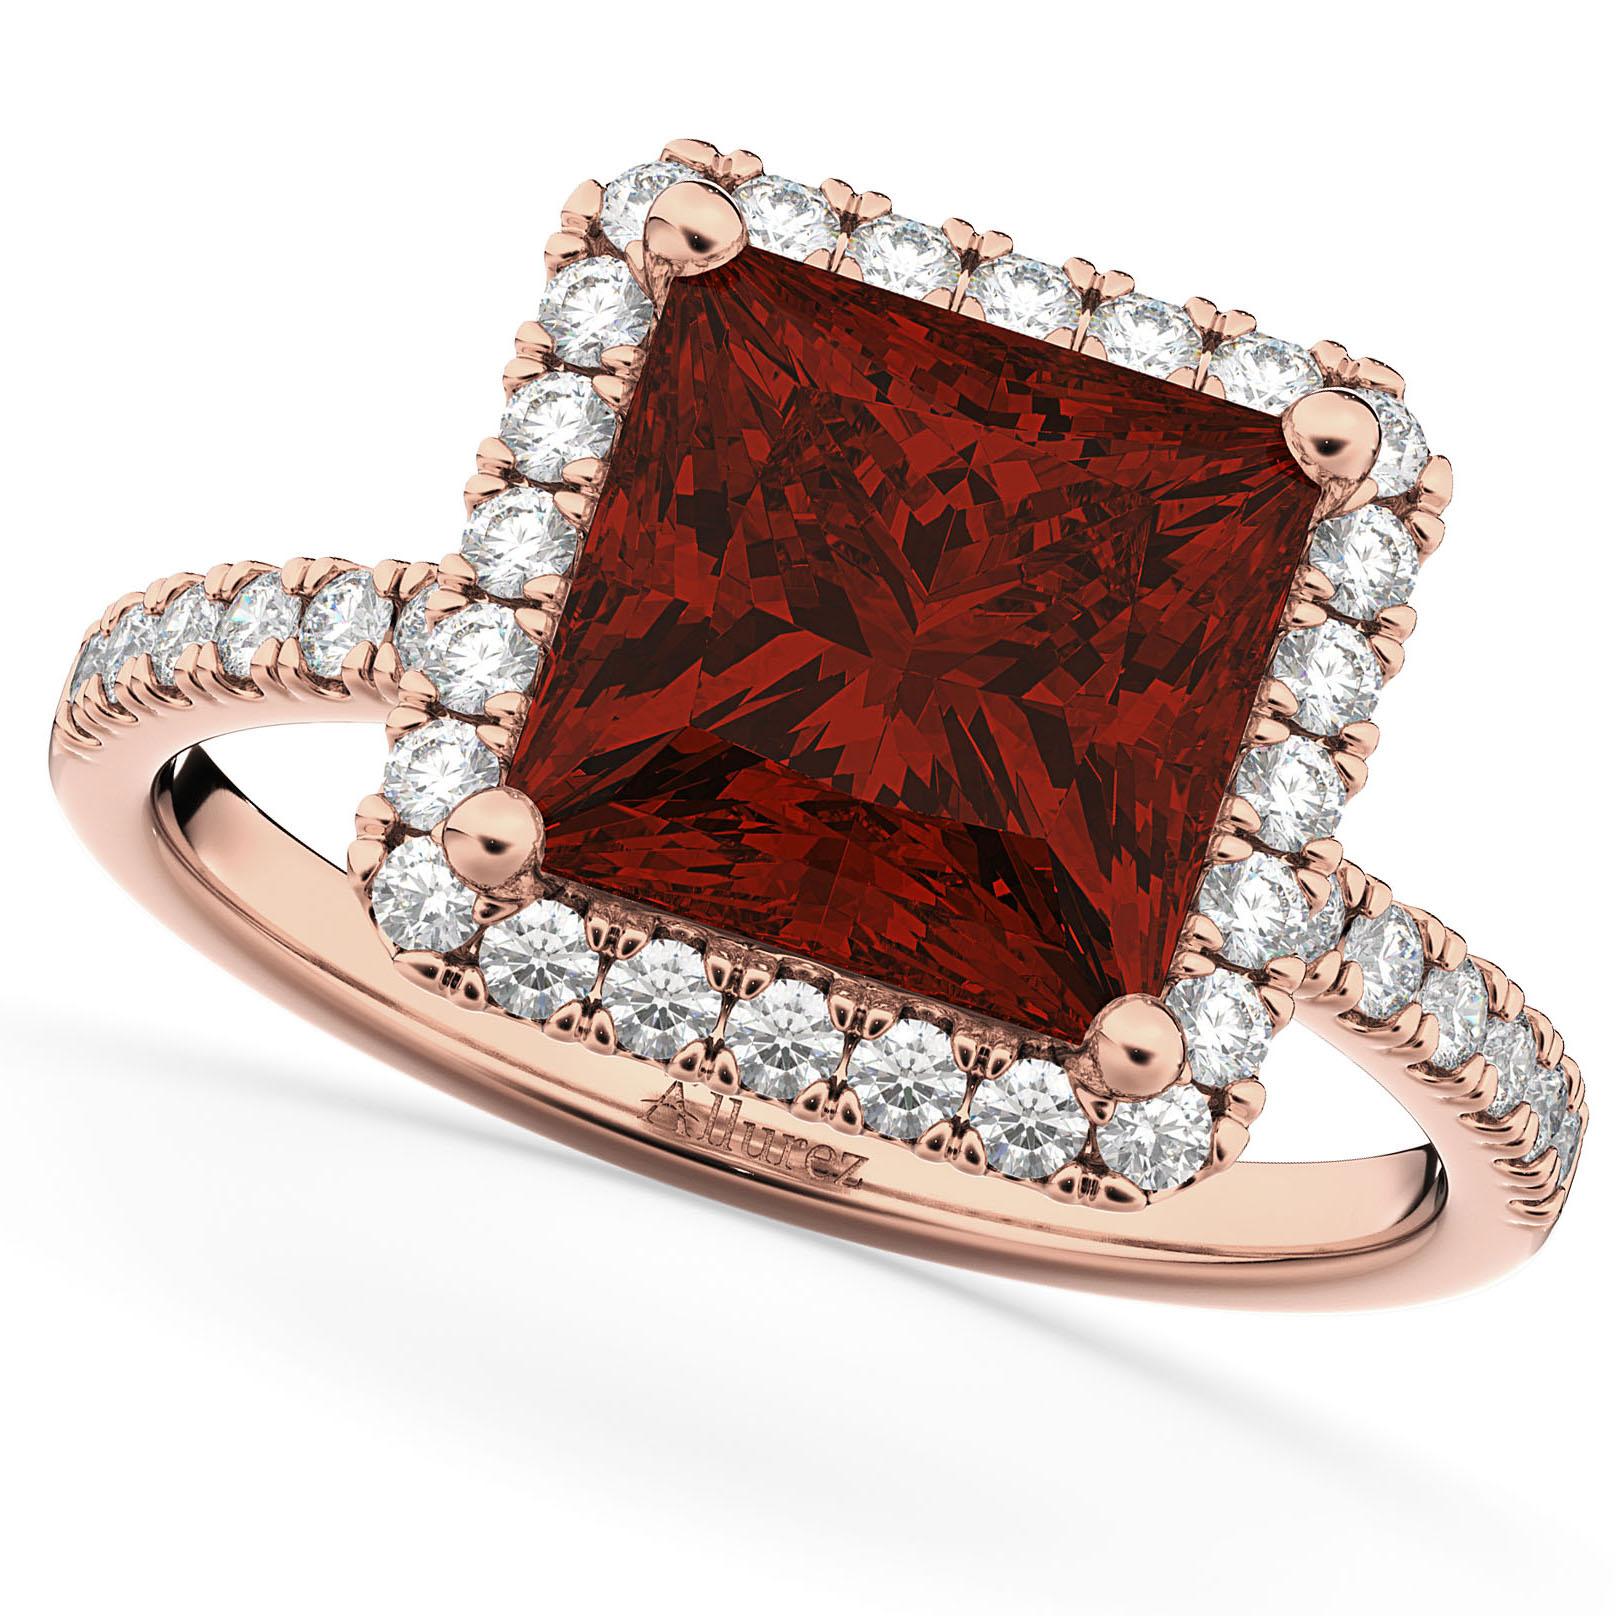 Princess Cut Halo Garnet & Diamond Engagement Ring 14K Rose Gold 3.47ct